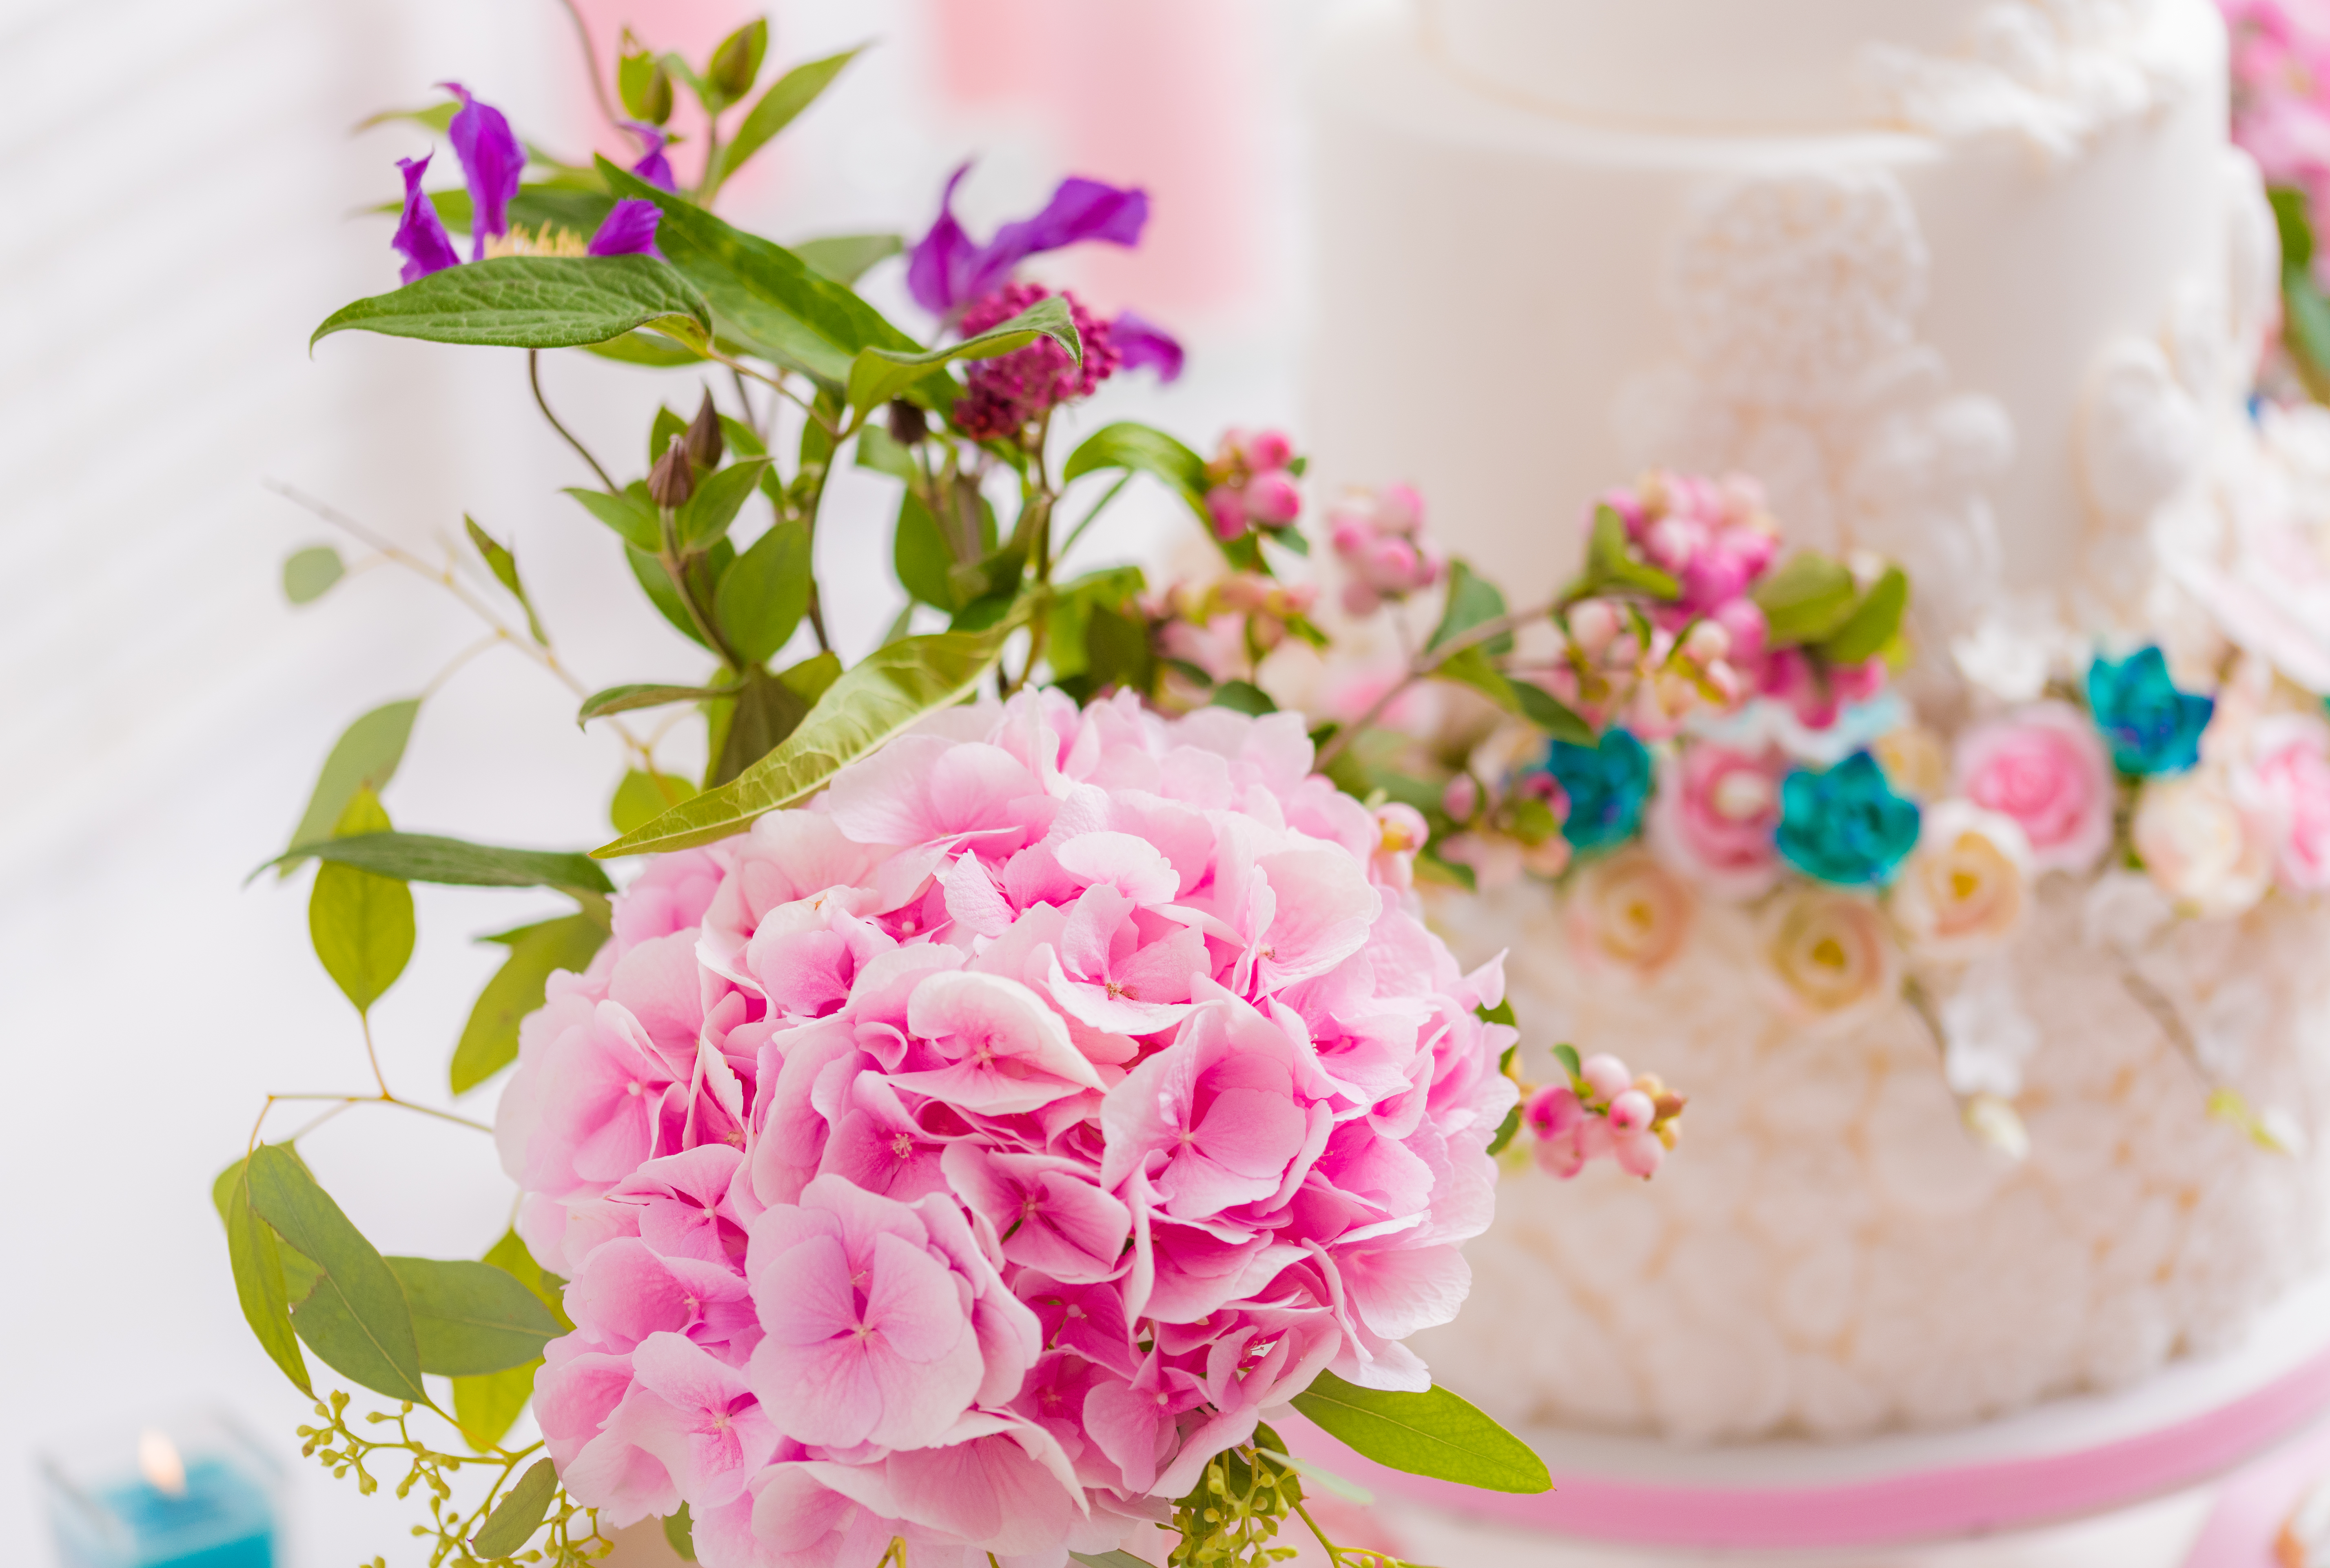 Tees Bakery | Luxury Wedding Cakes on Feedspot - Rss Feed